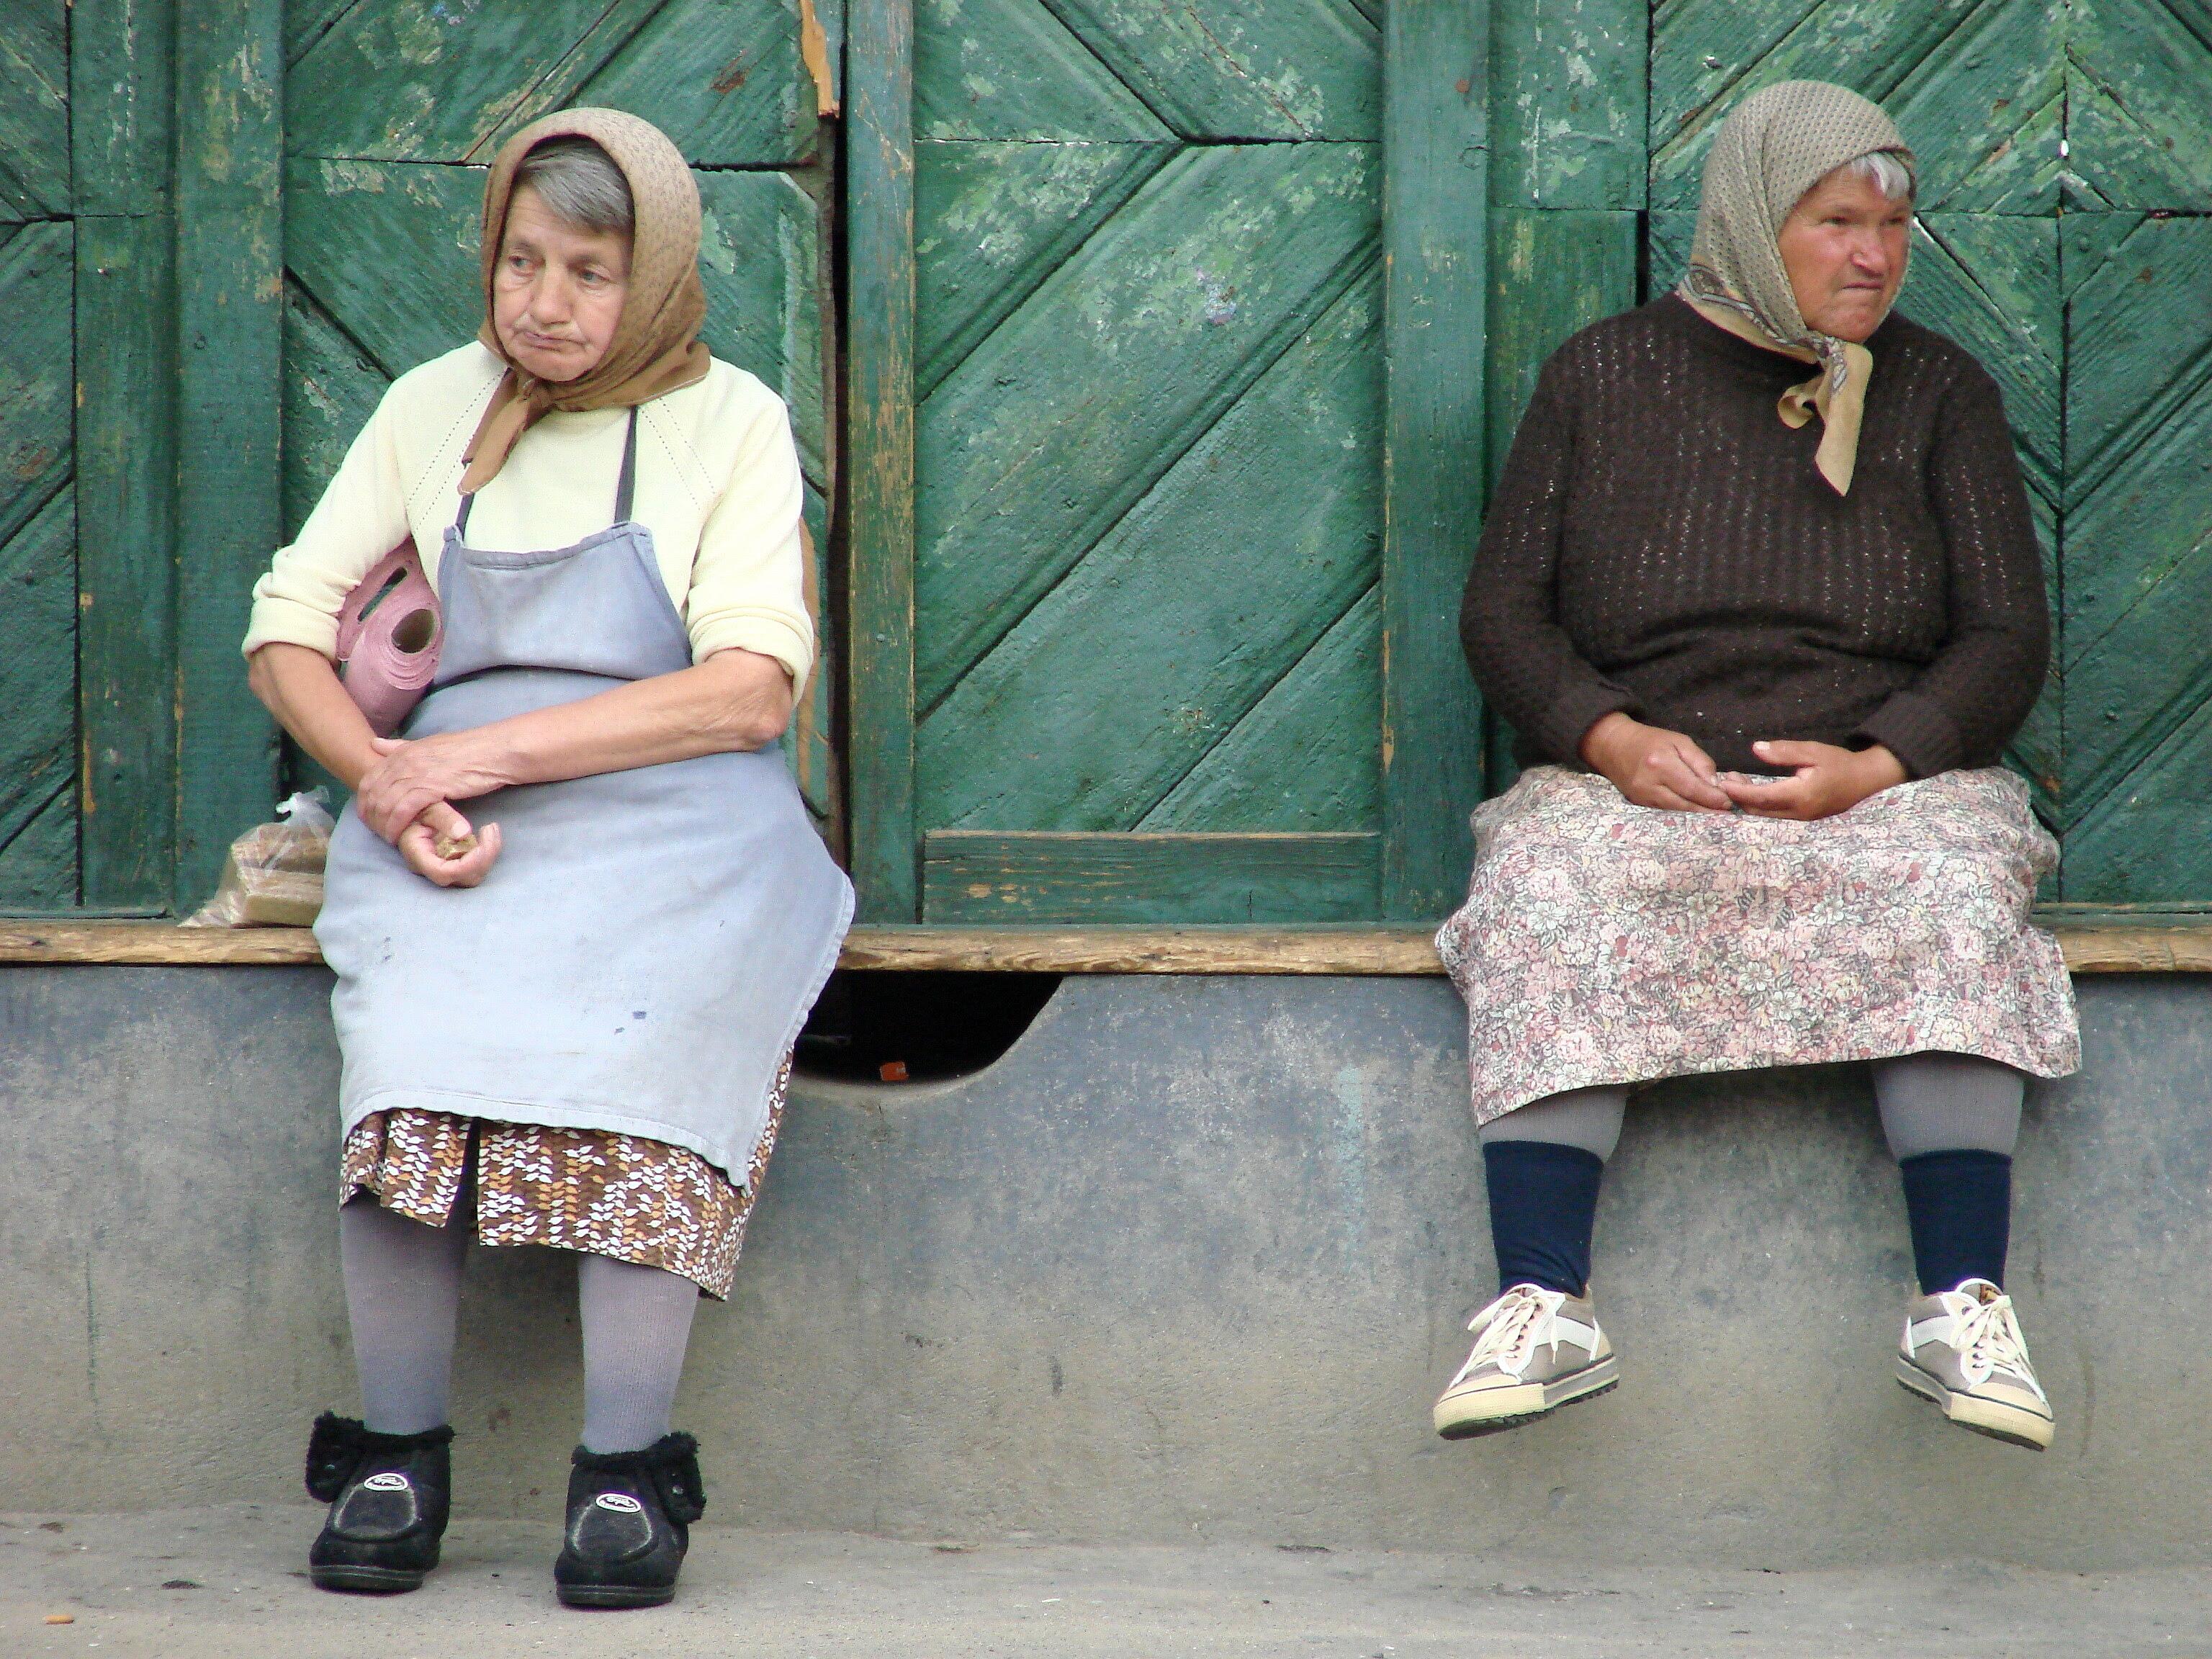 http://upload.wikimedia.org/wikipedia/commons/3/3b/Old_Women_-_Biertan_-_Romania.jpg